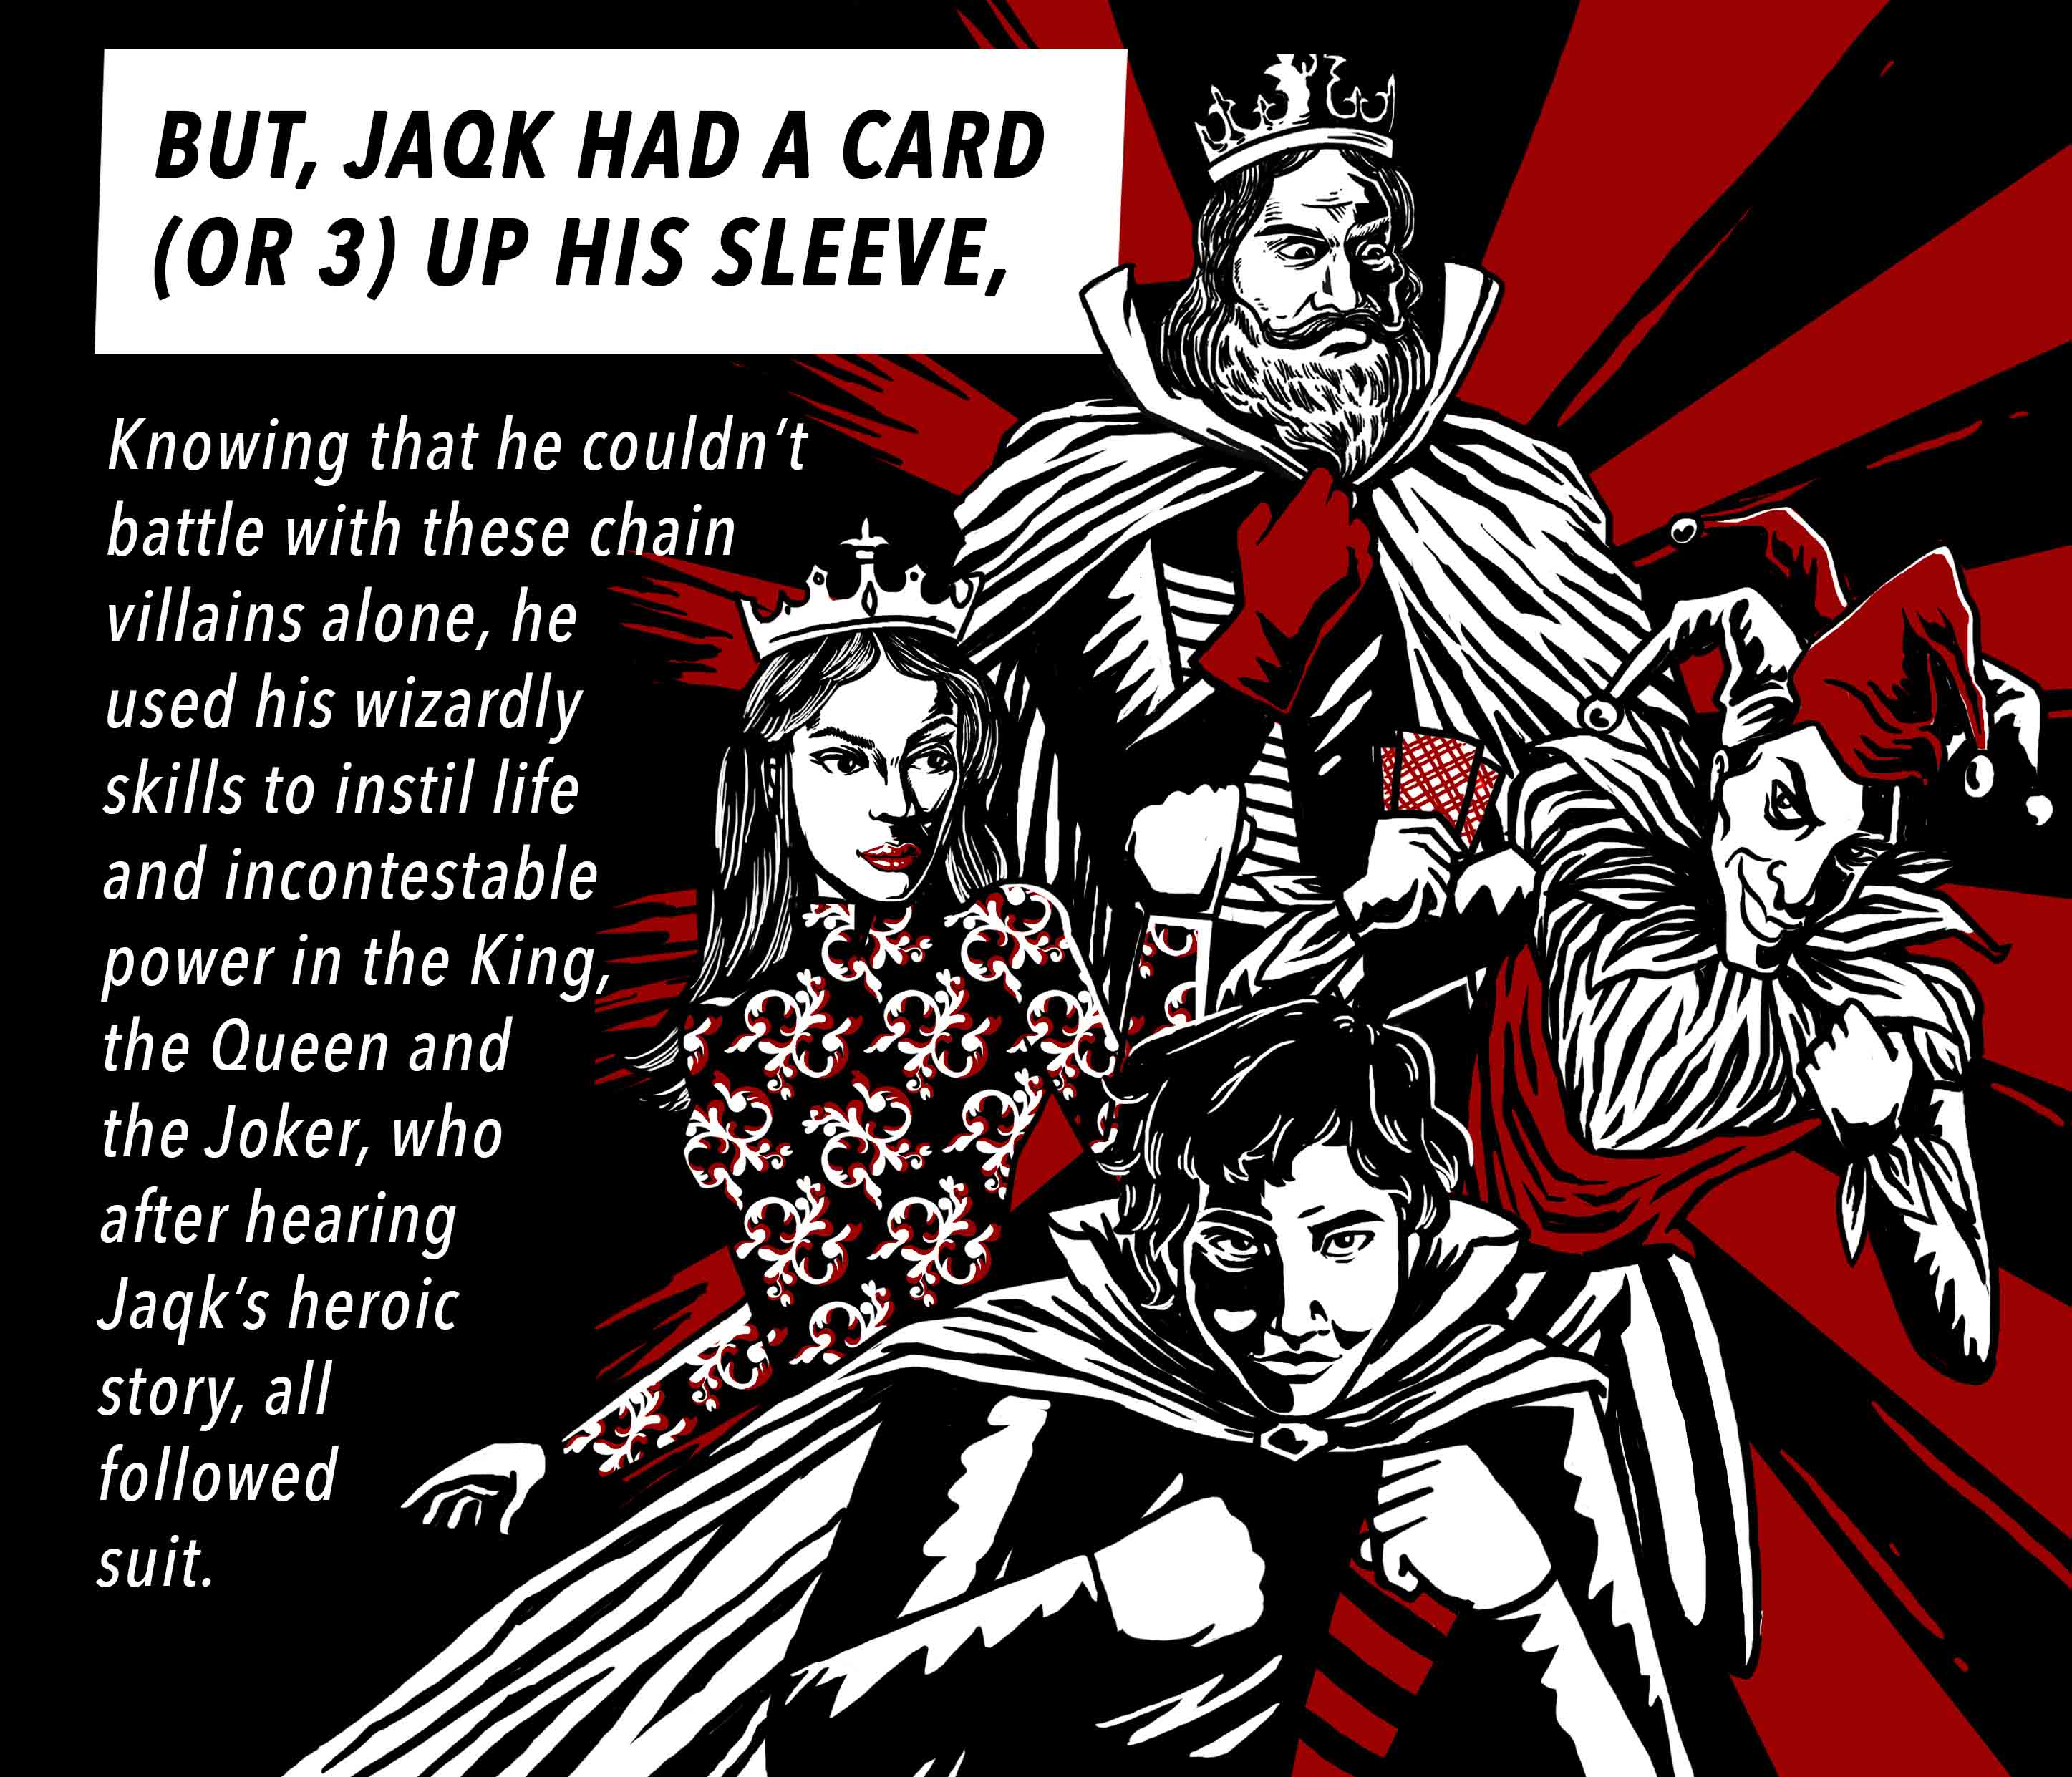 JAQK'S STORY 4